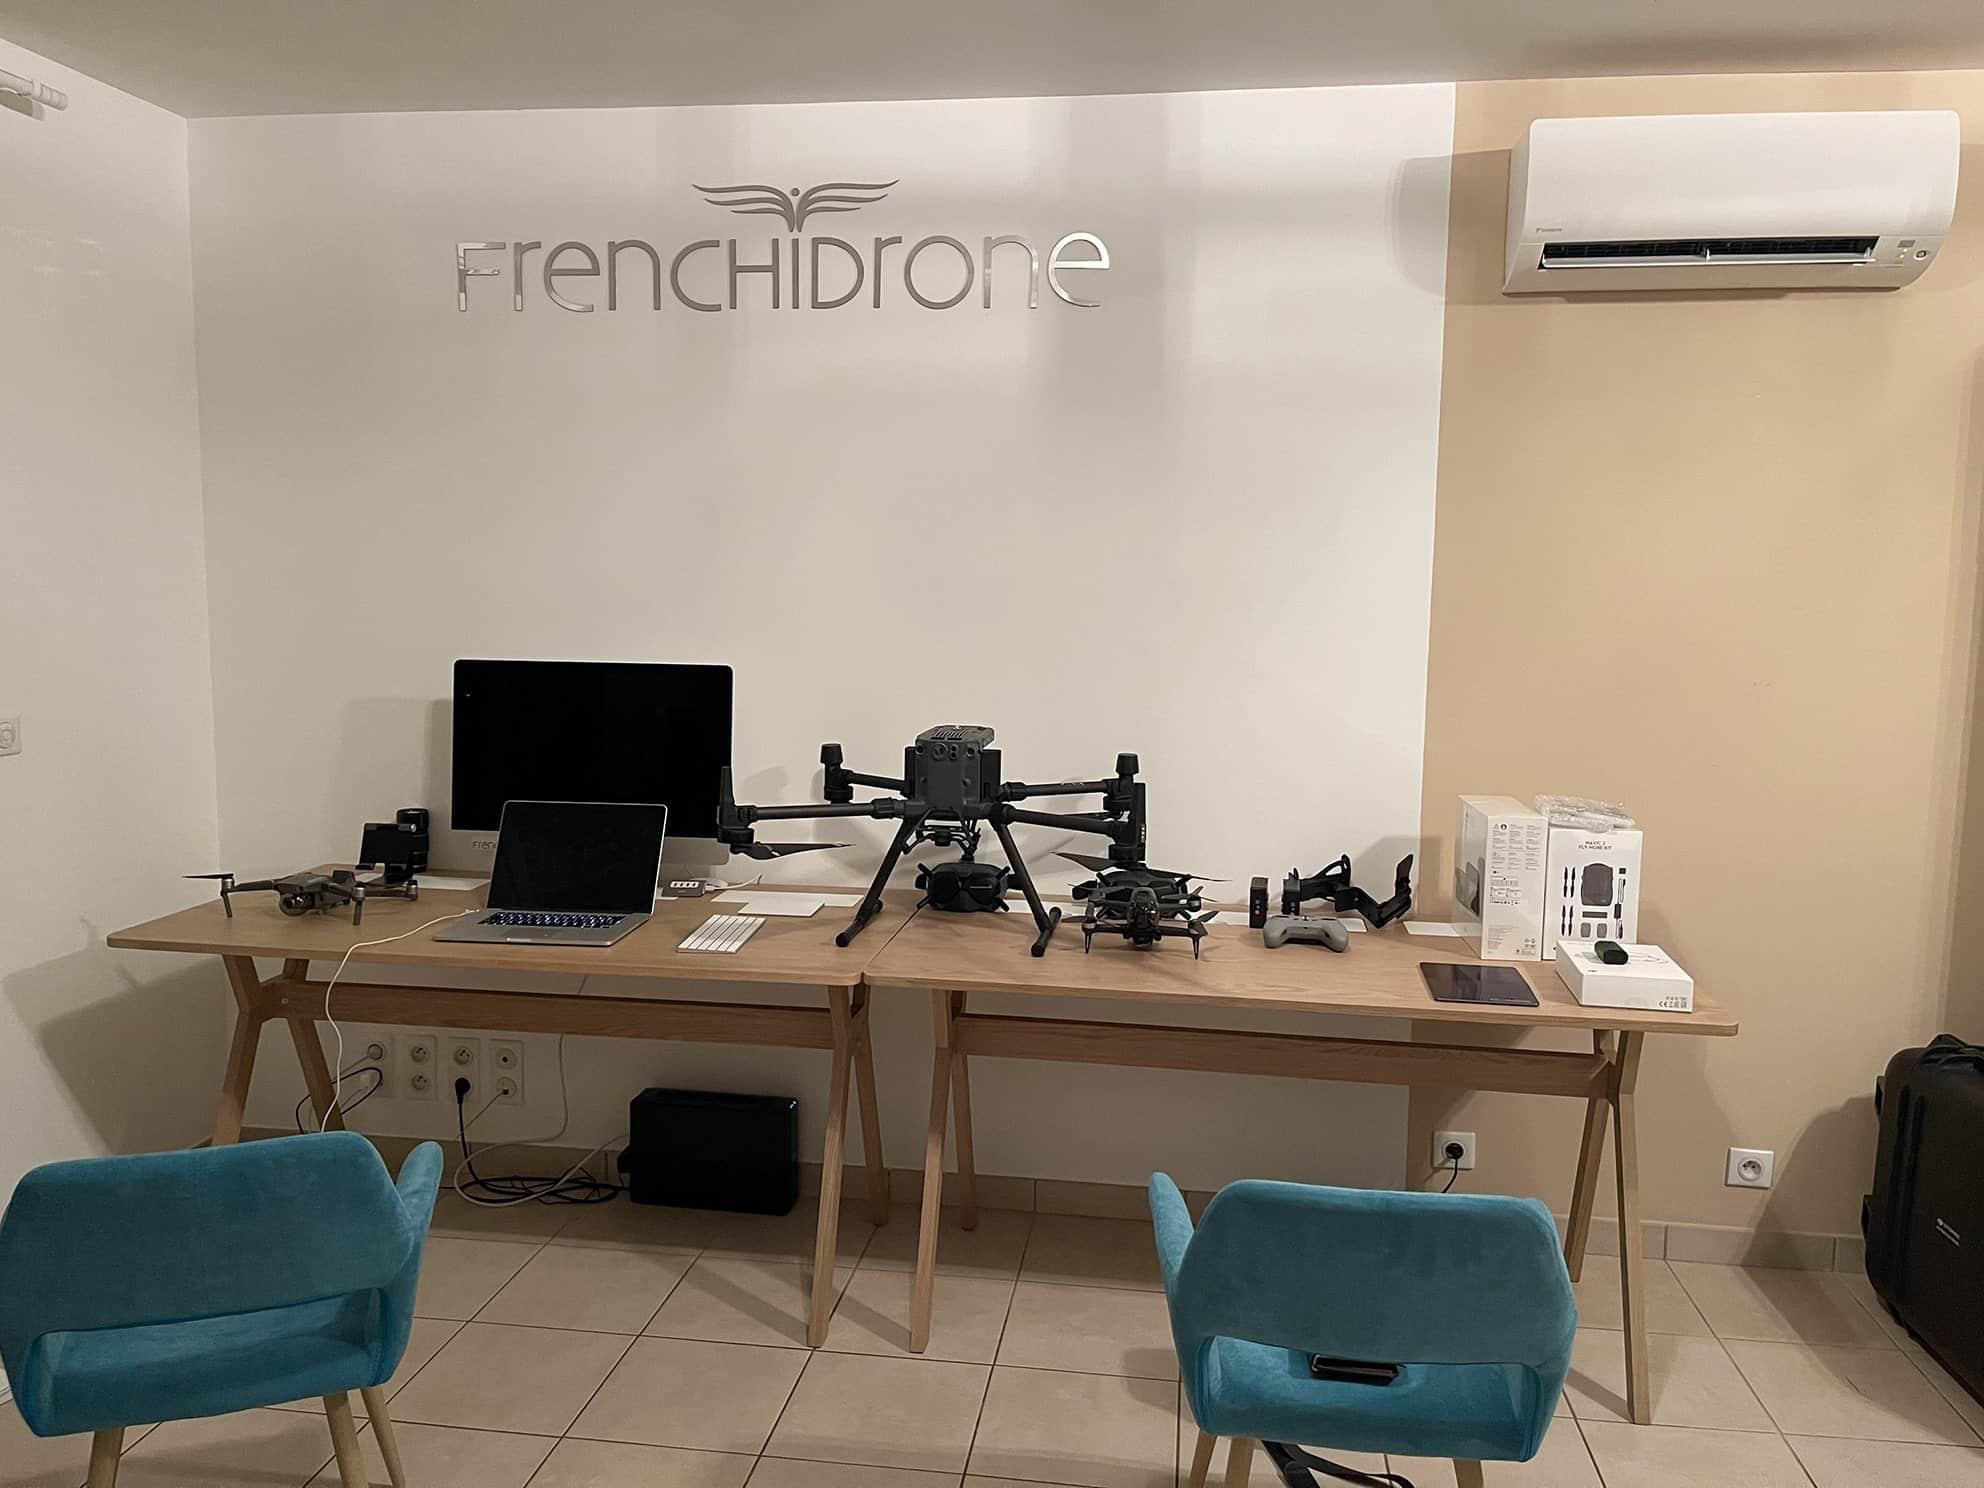 Frenchidrone-Labo-min